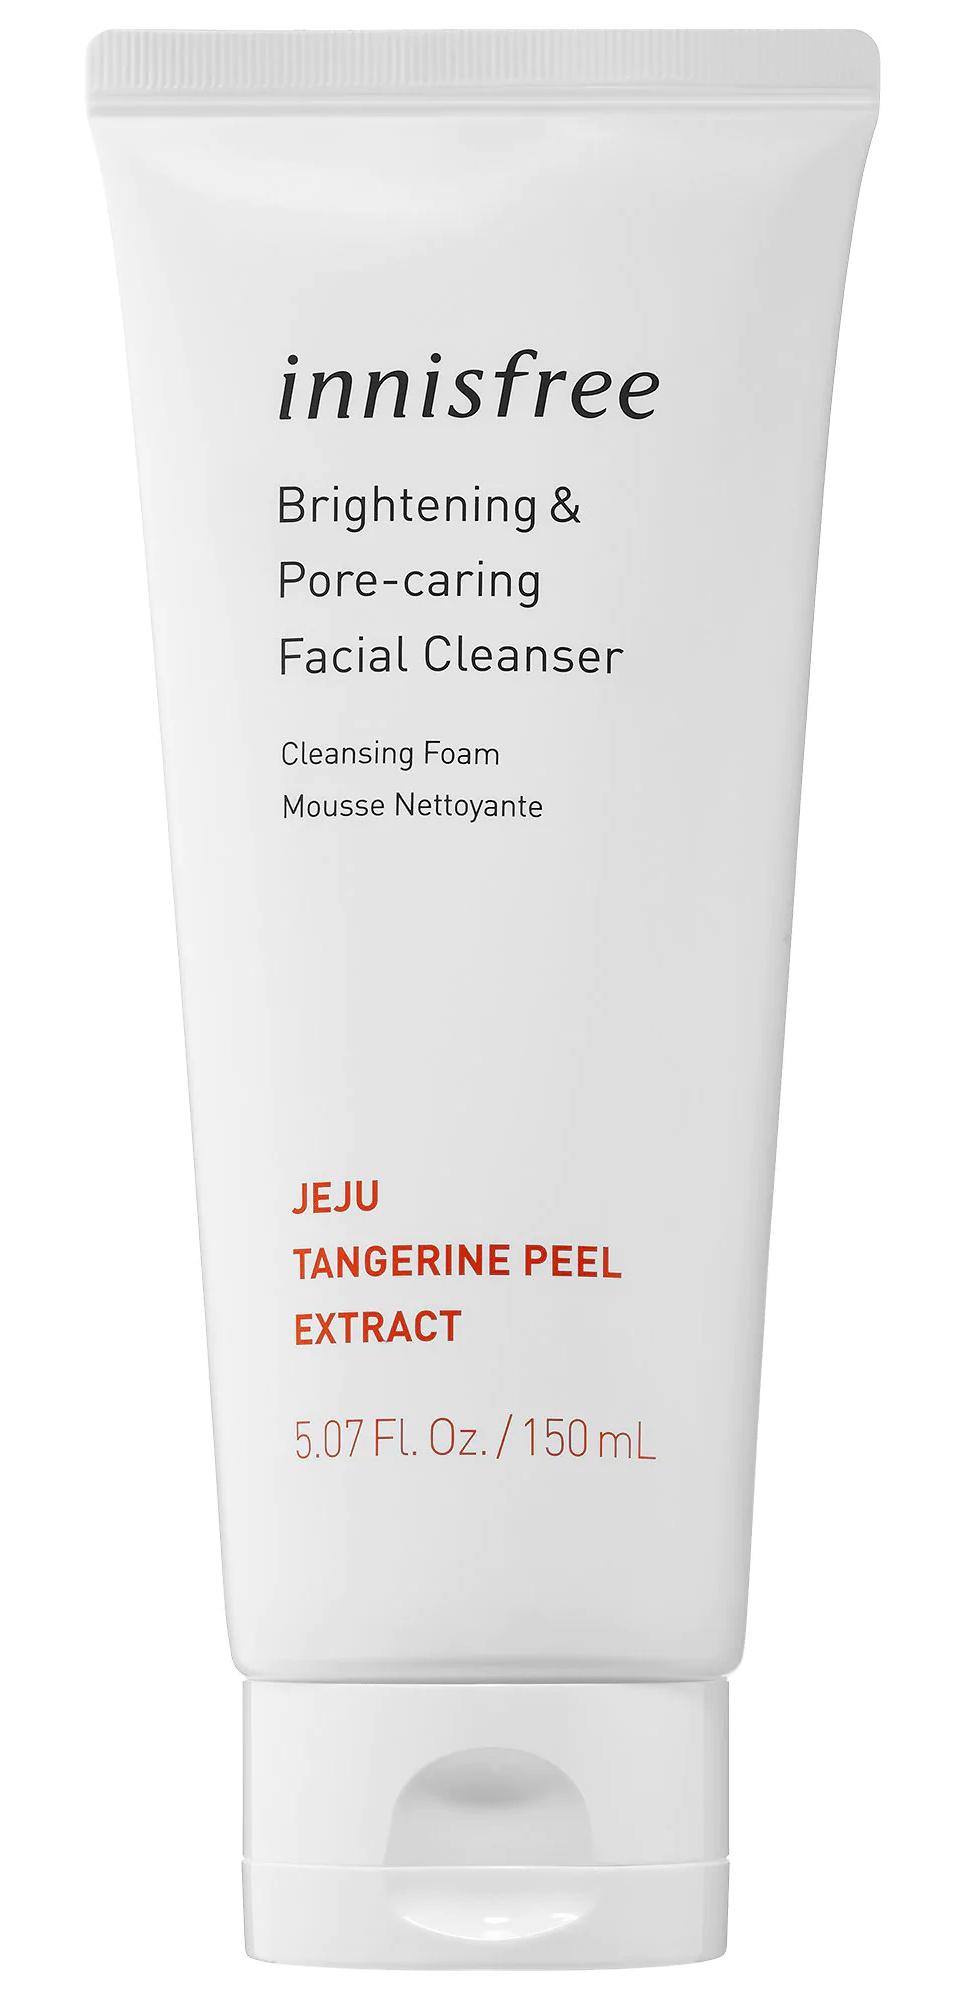 innisfree Tangerine Brightening & Pore-Refining Cleanser